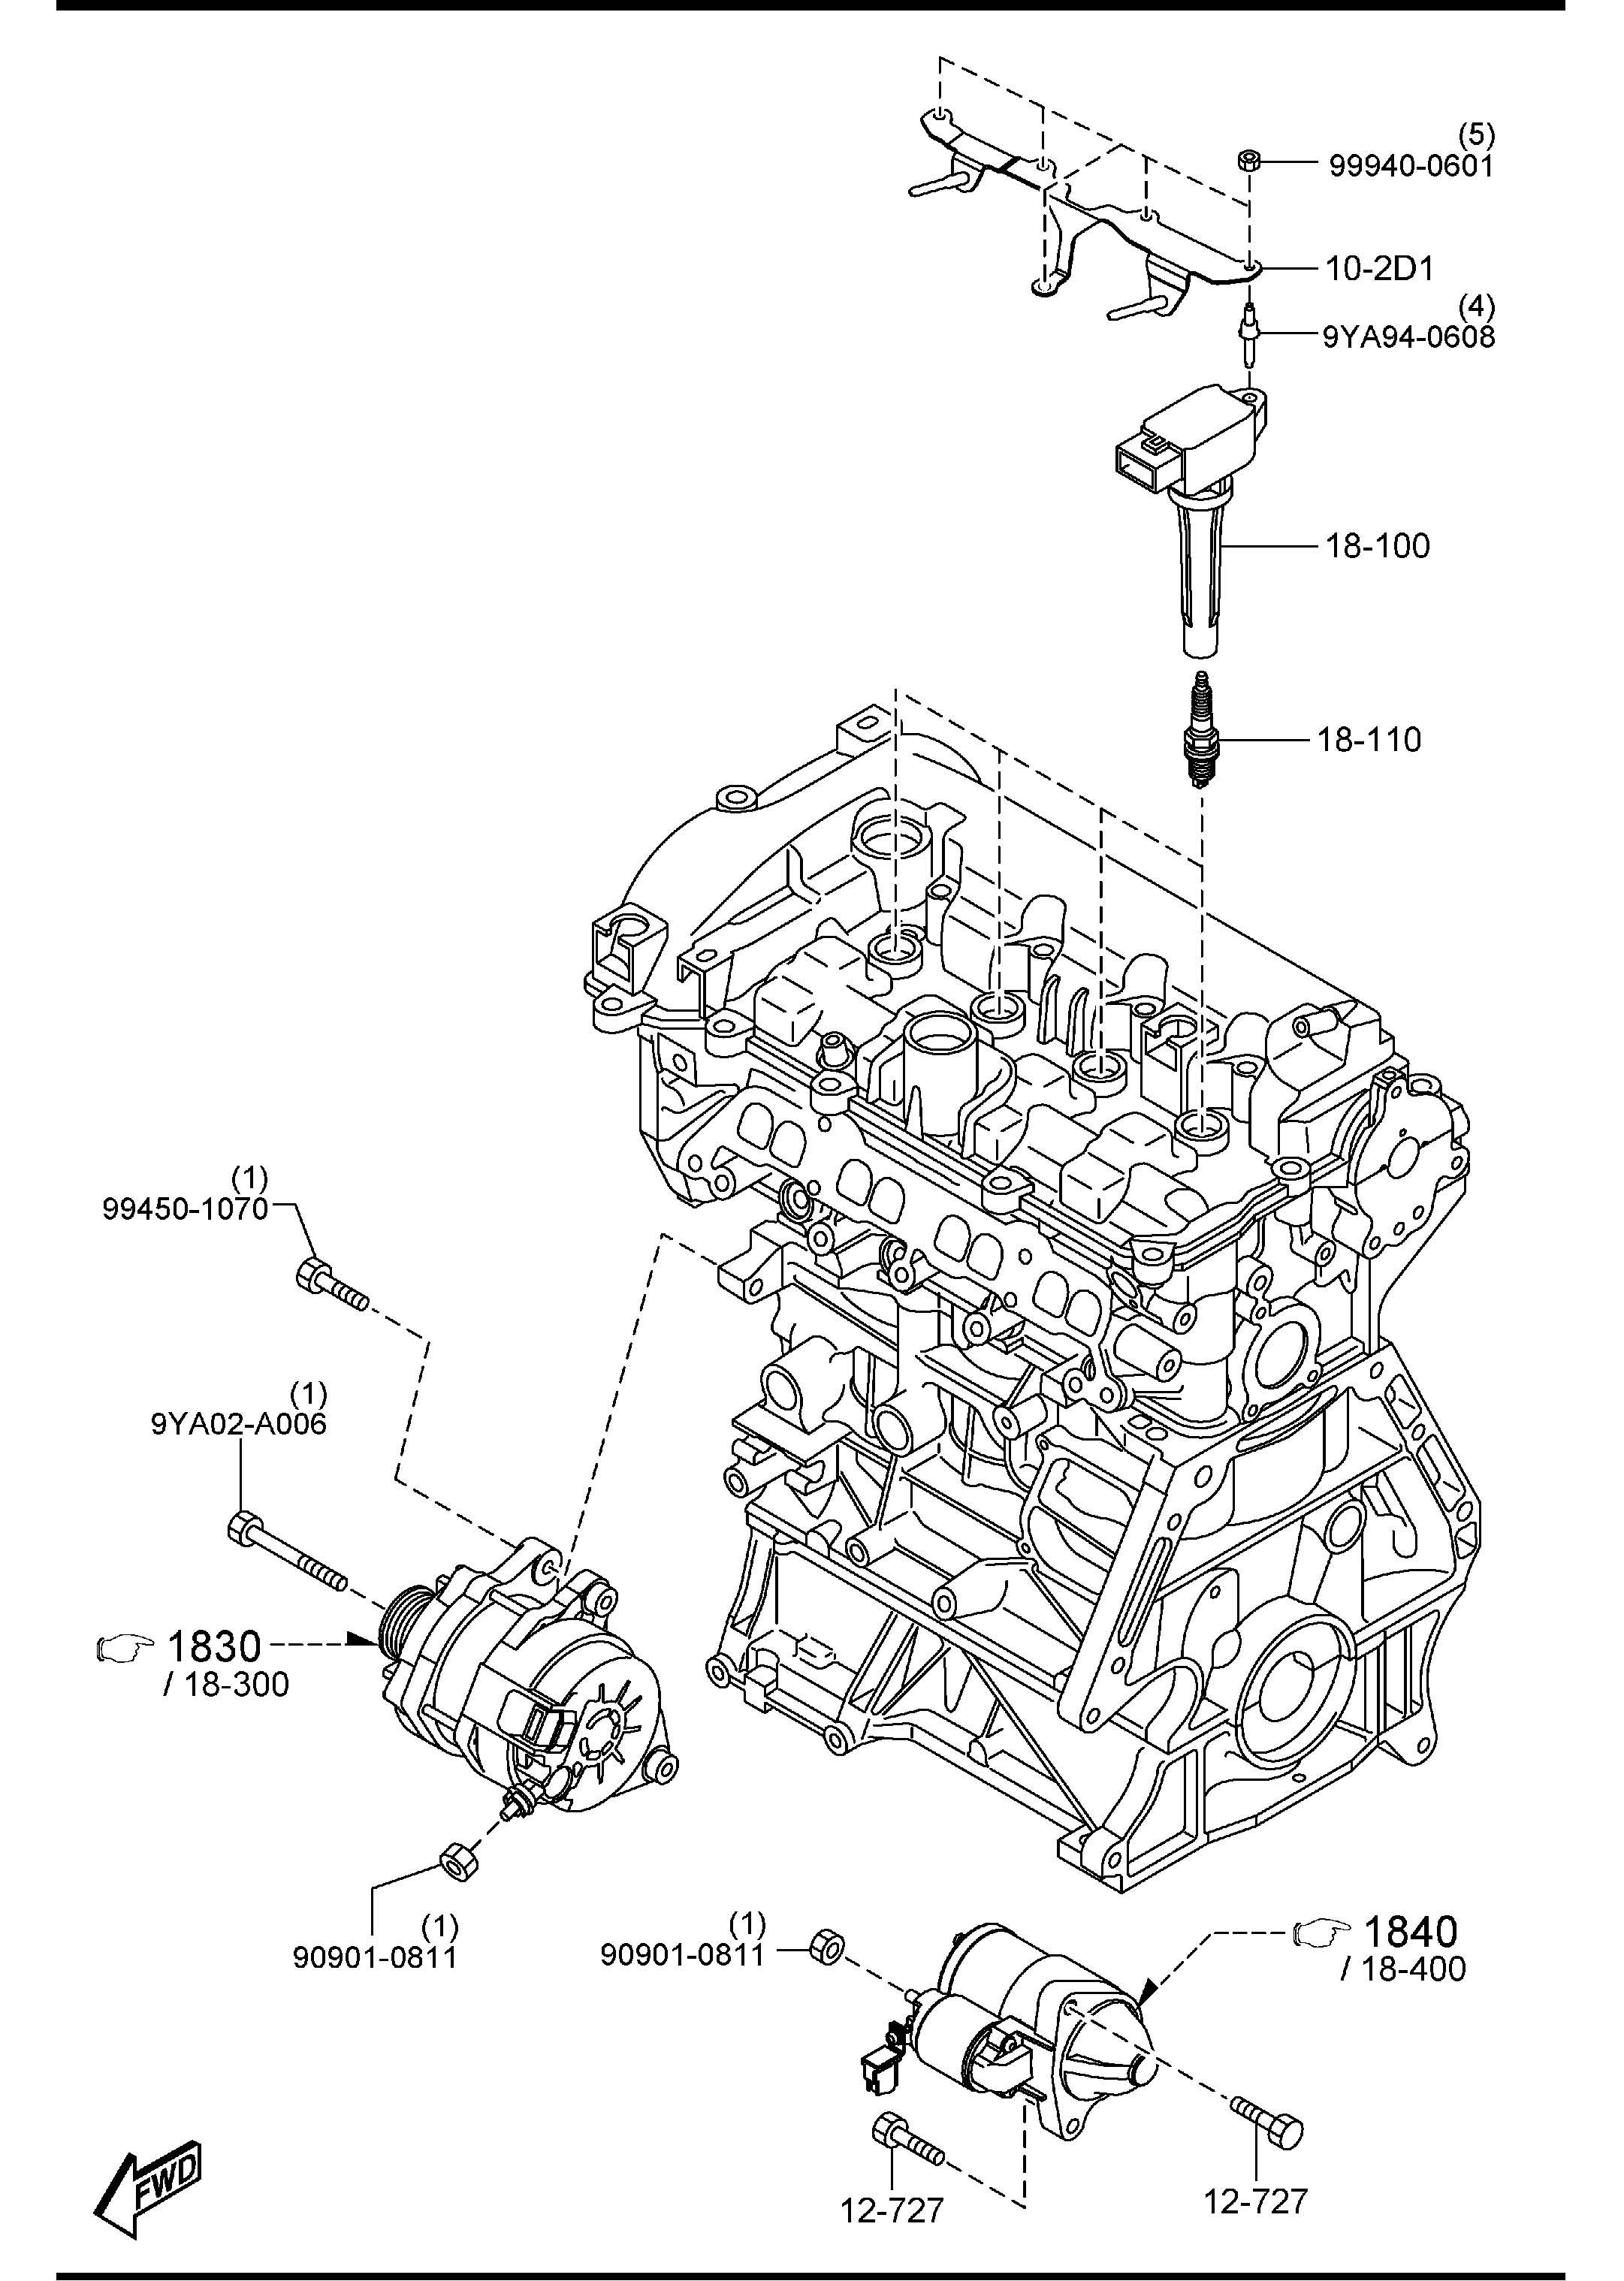 Mazda Mazda 3 Plug, spark ngk. Supplier, selection, denso